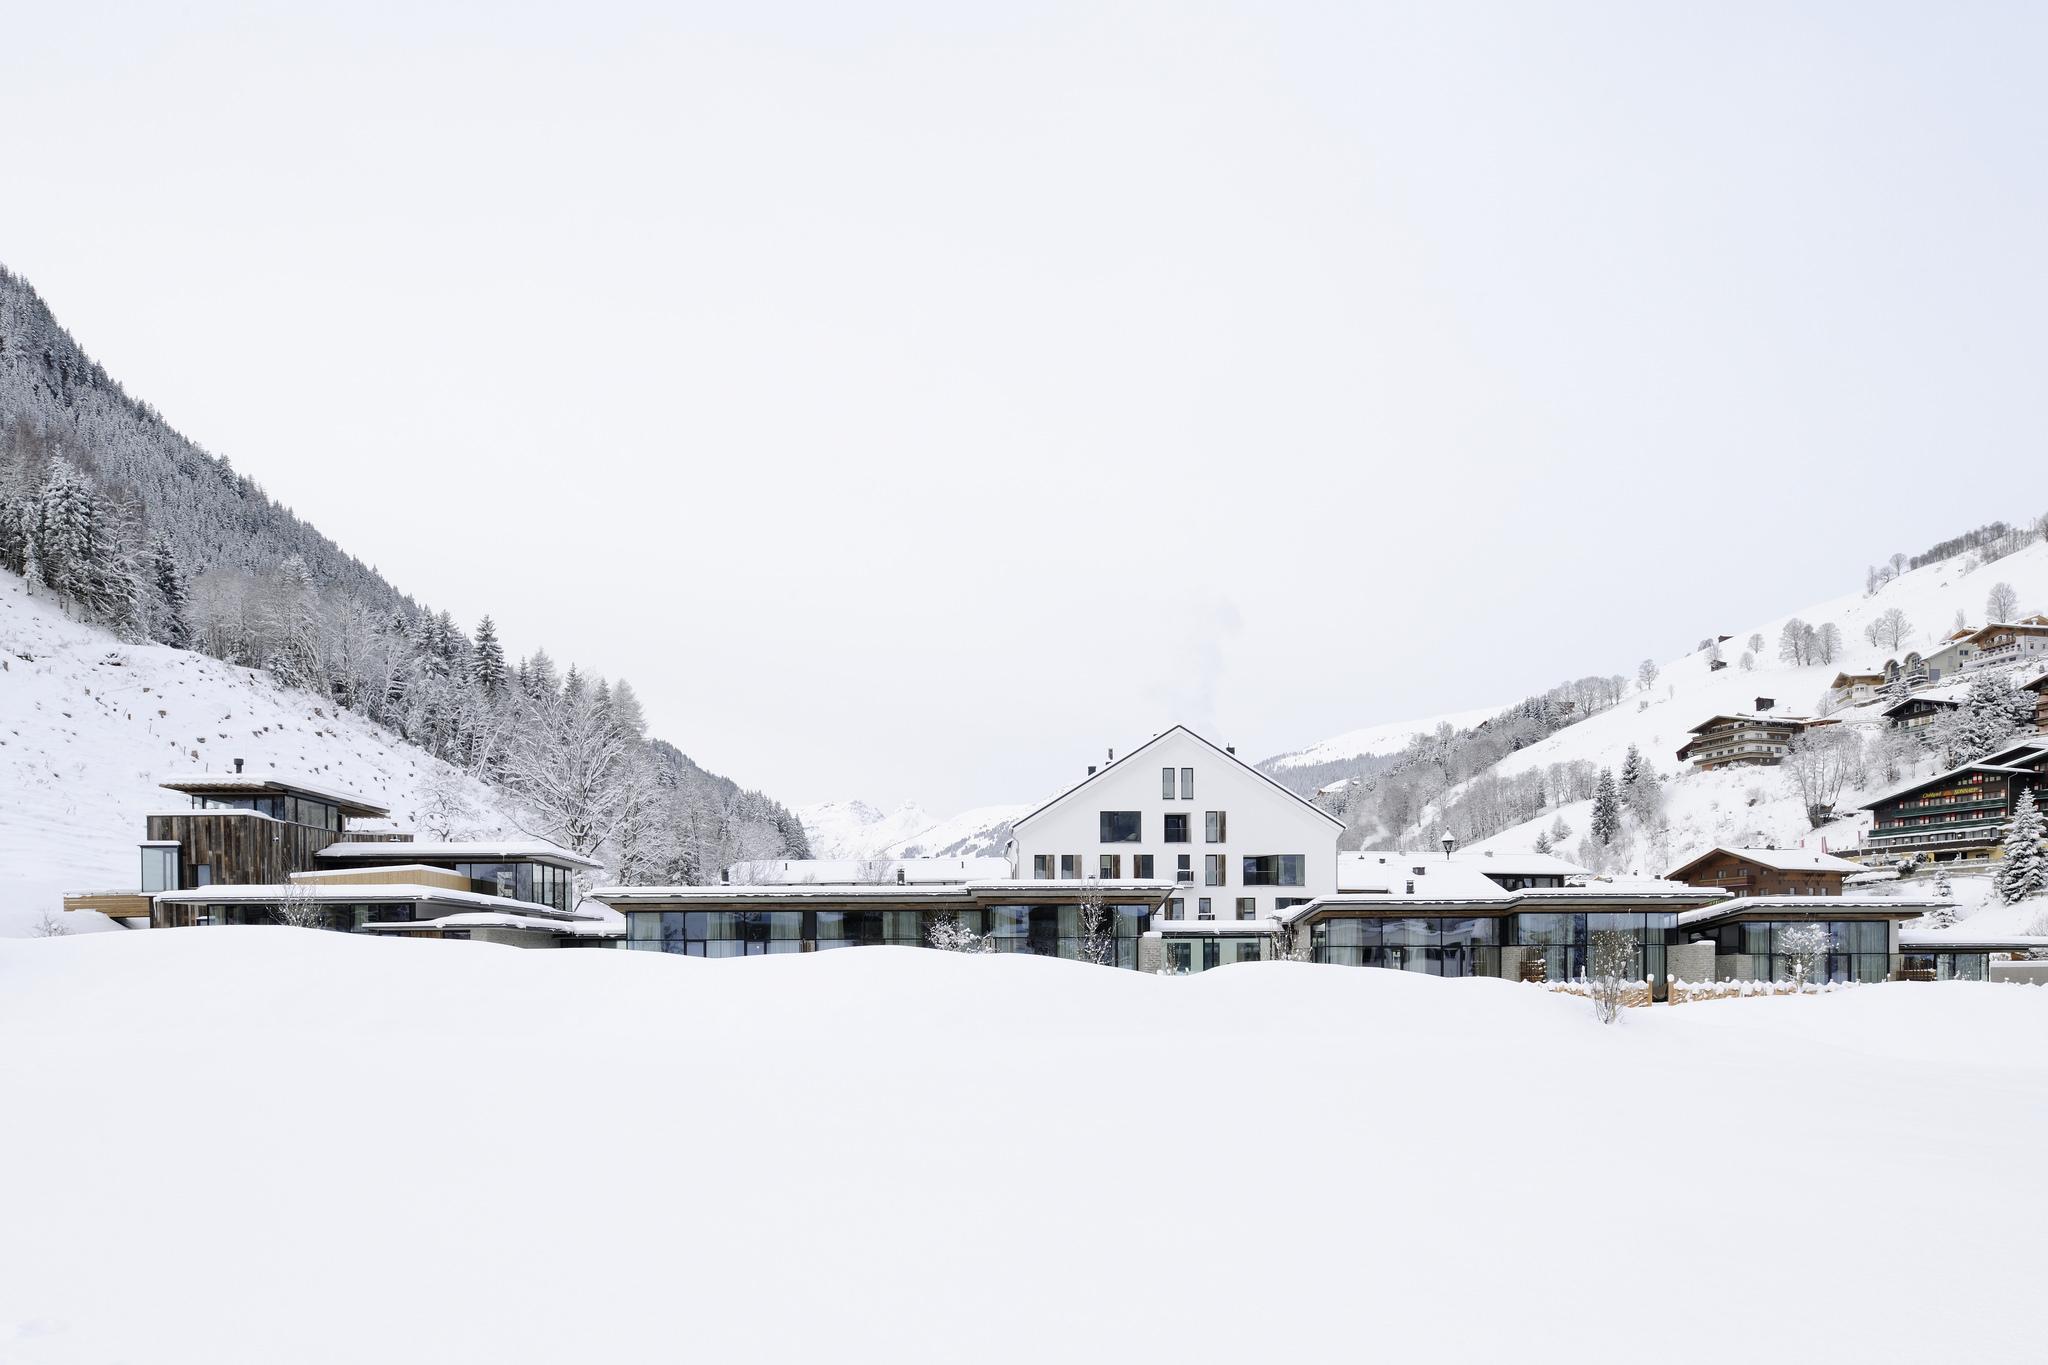 Hotel Wiesergut / Saalbach Hinterglemm, Austria